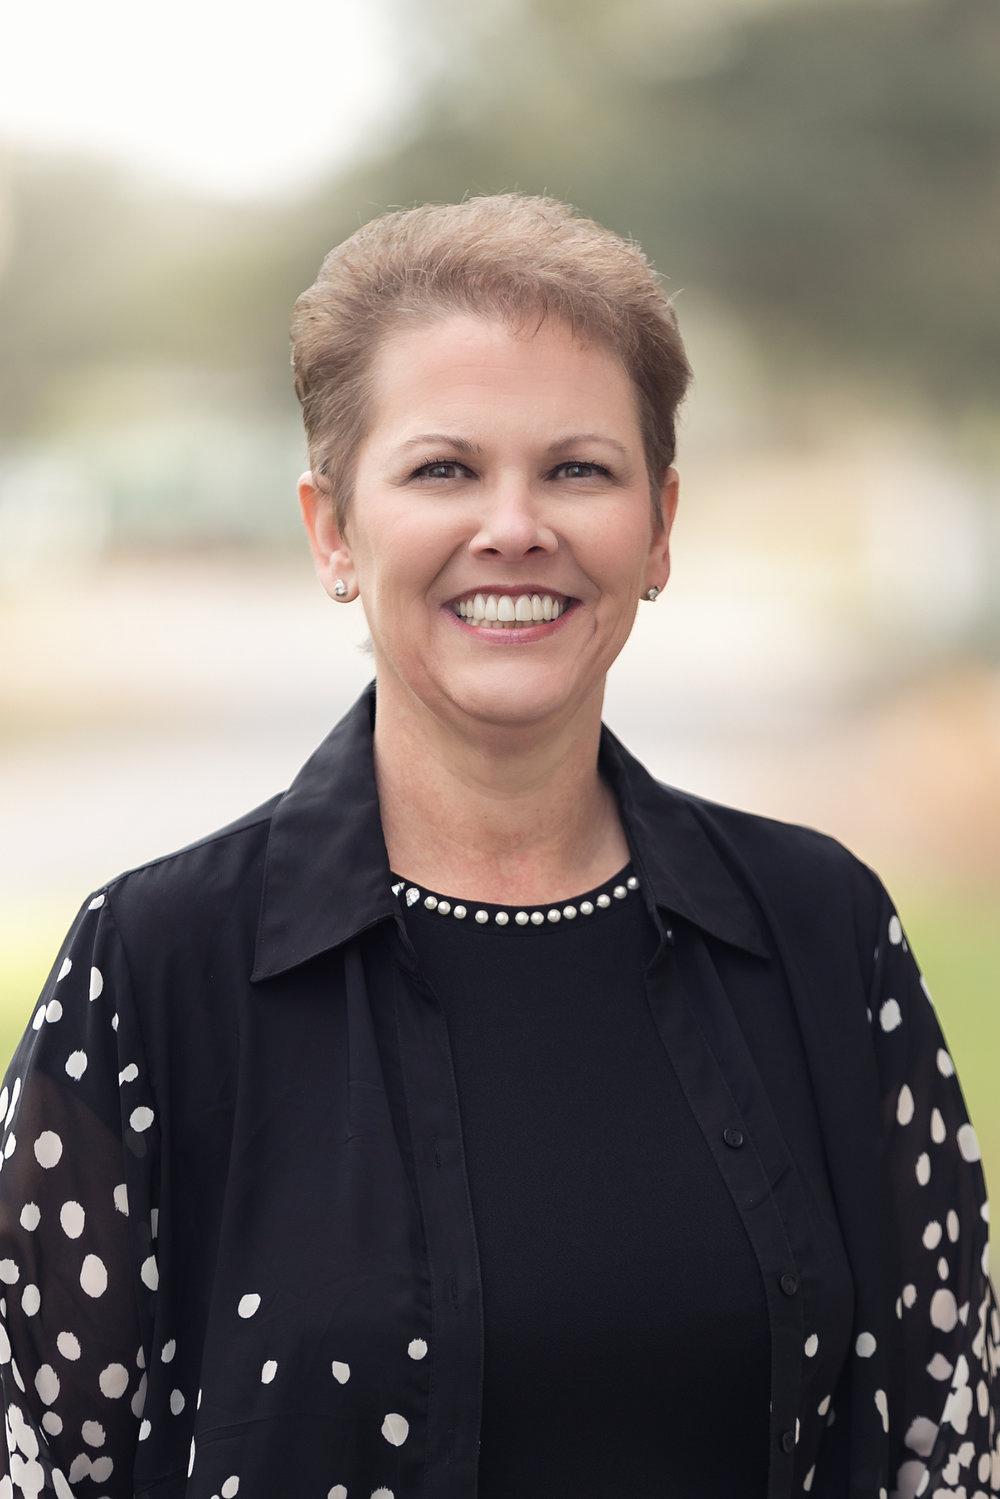 Julie Curley, RN, Administrator